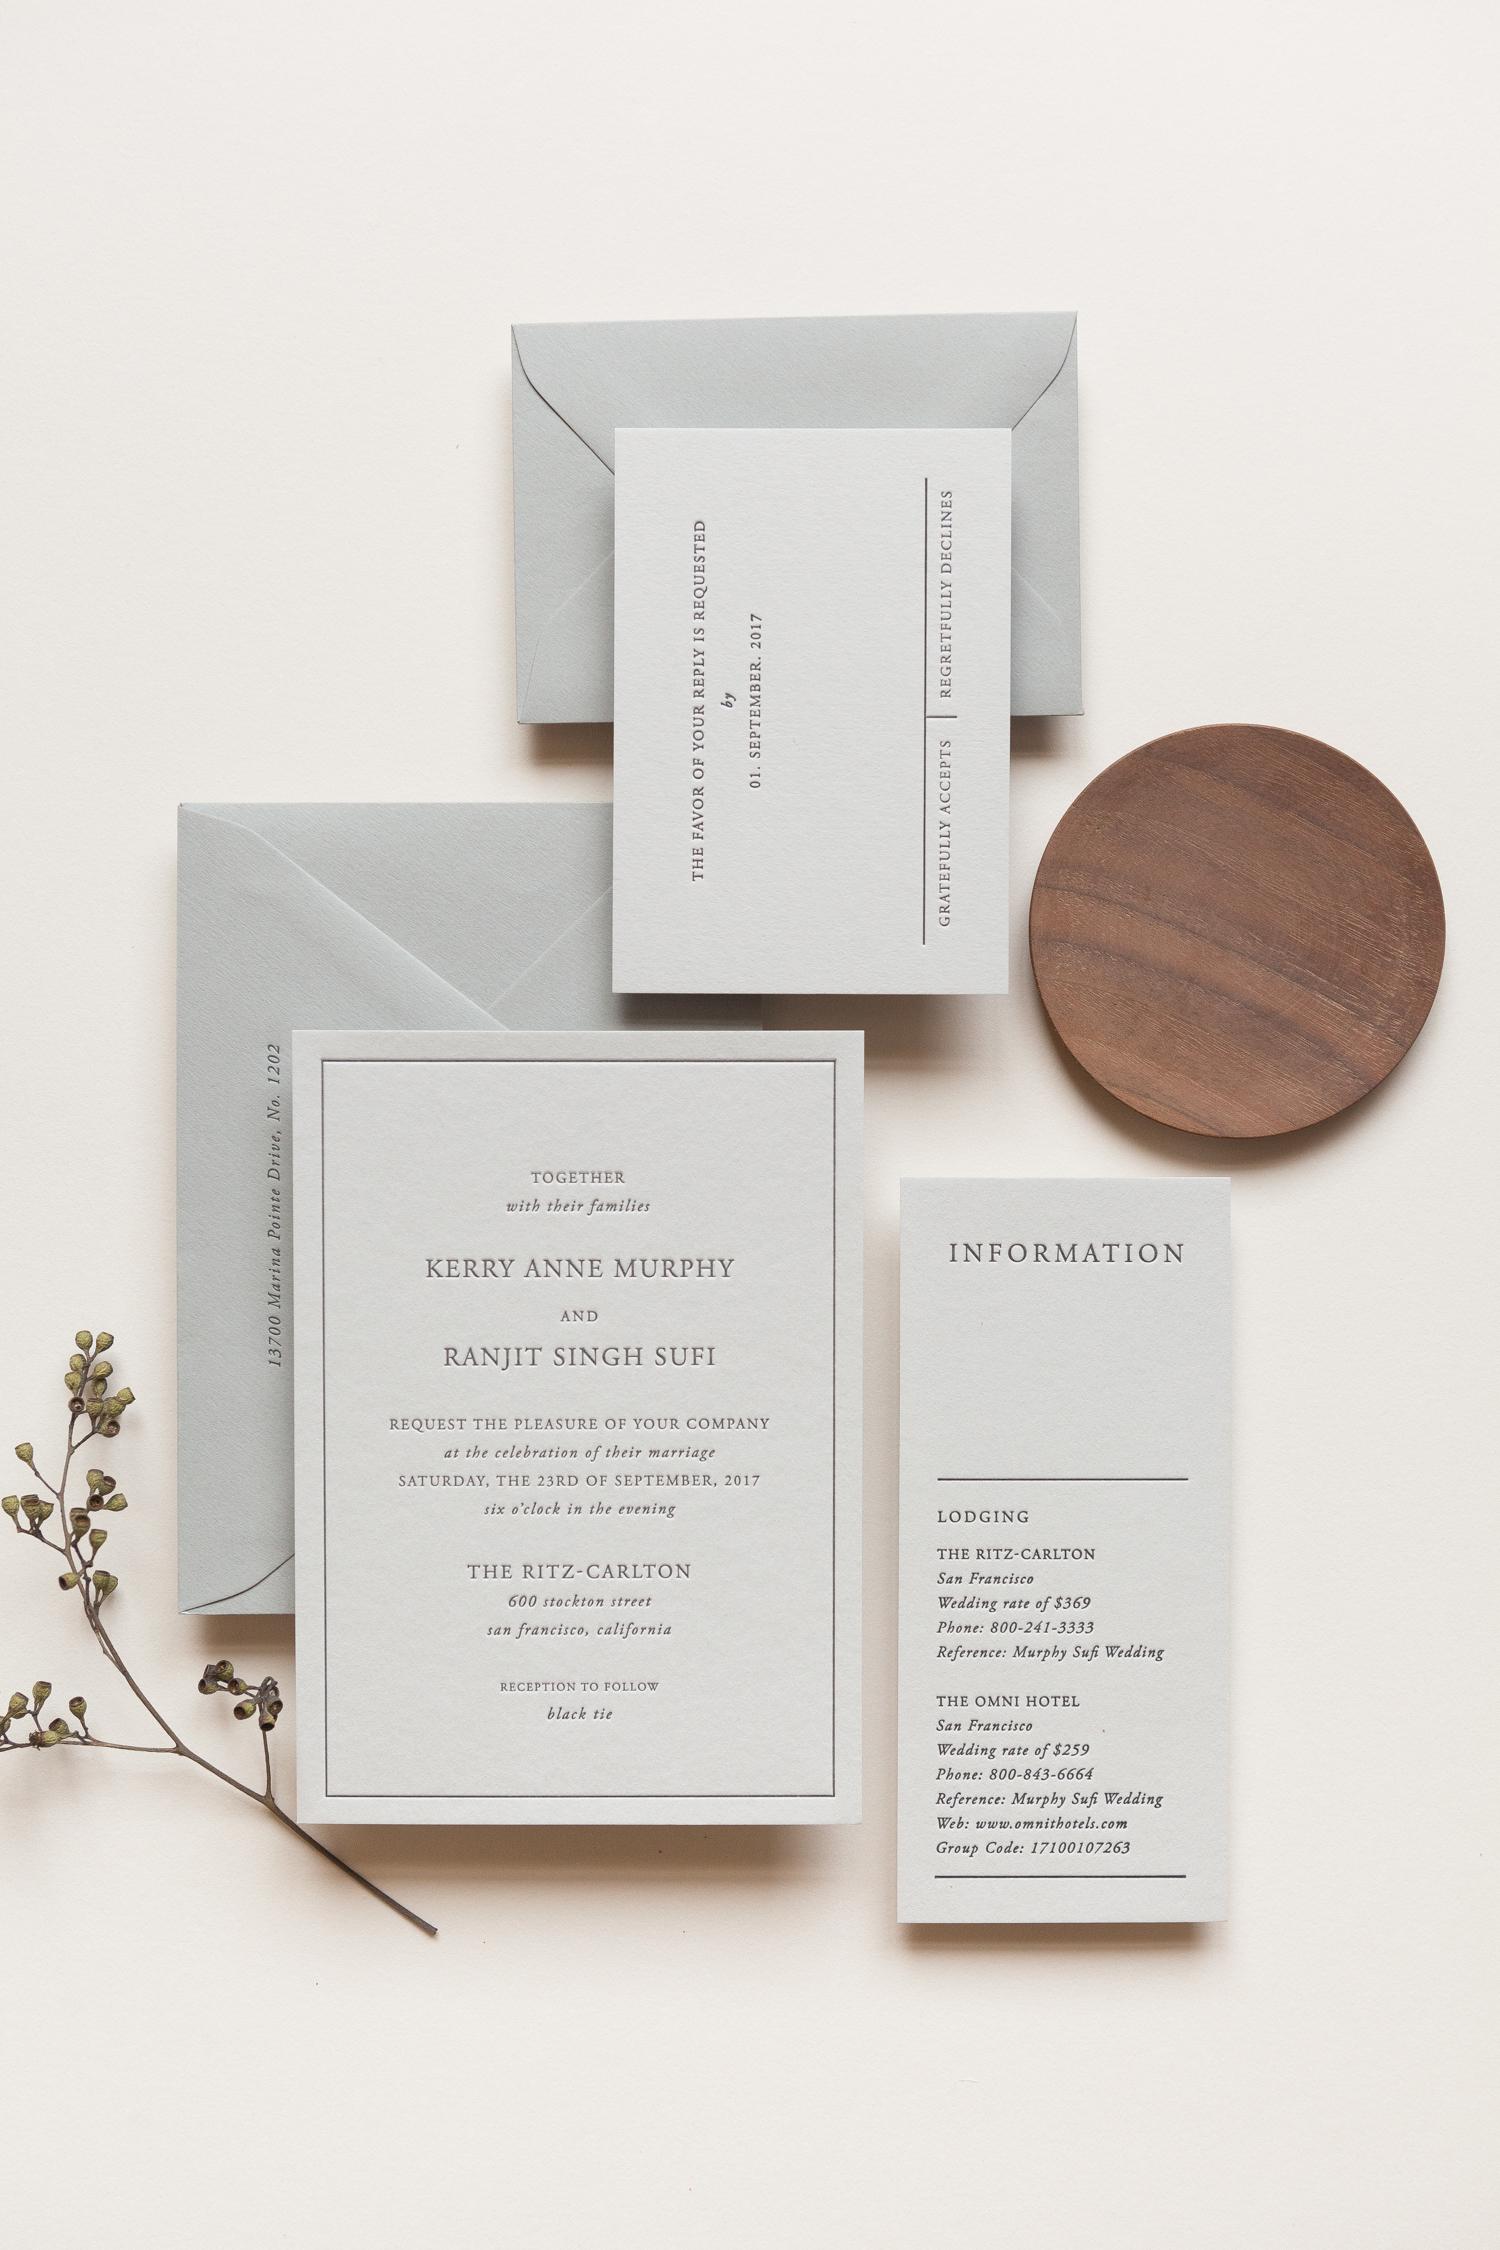 wedding invitation negative space letterpress serif type bold lines